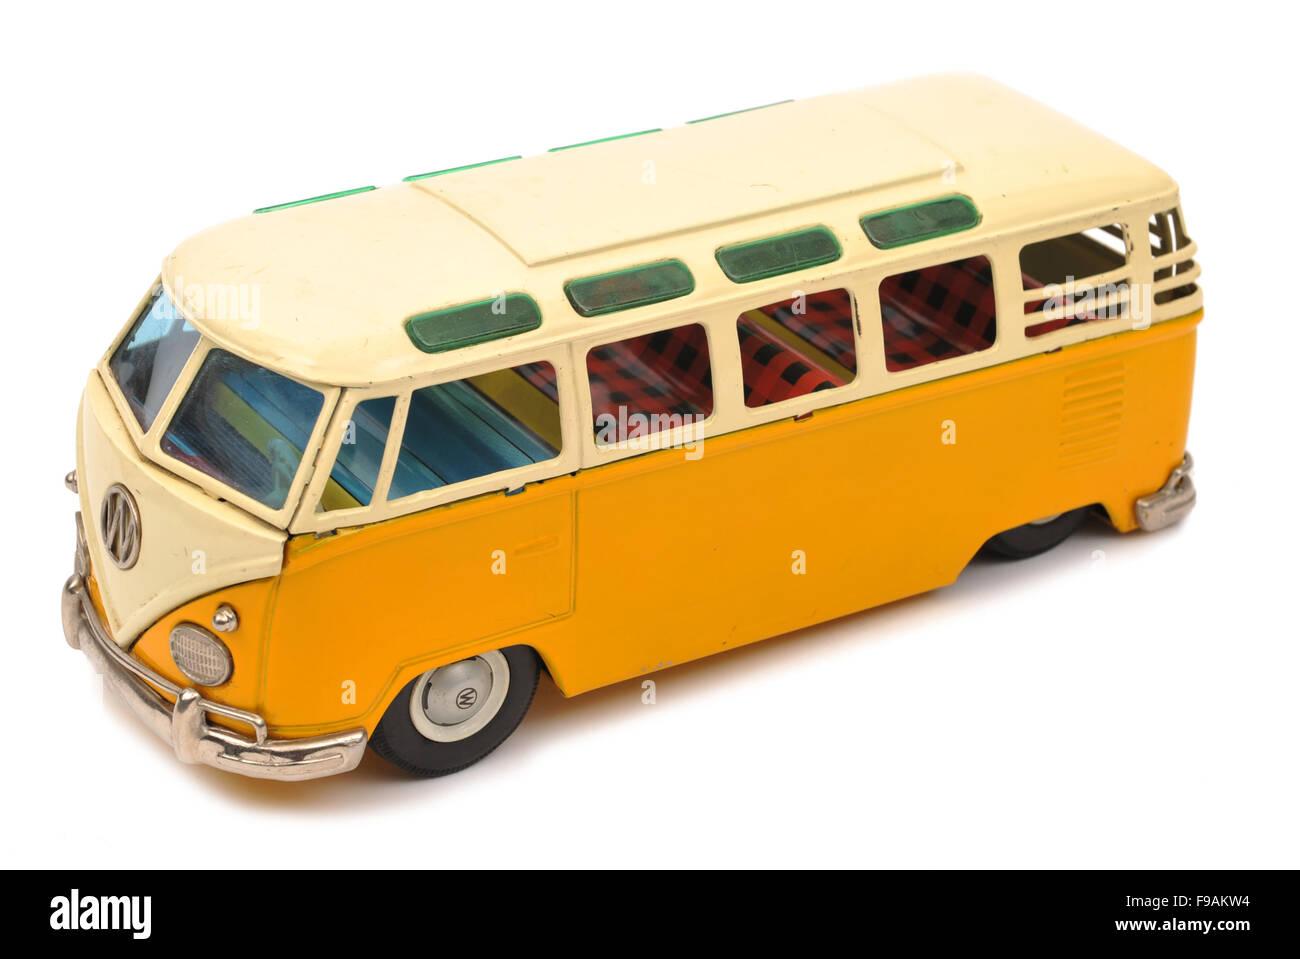 Children's tinplate Volkswagen Microbus toy - Stock Image